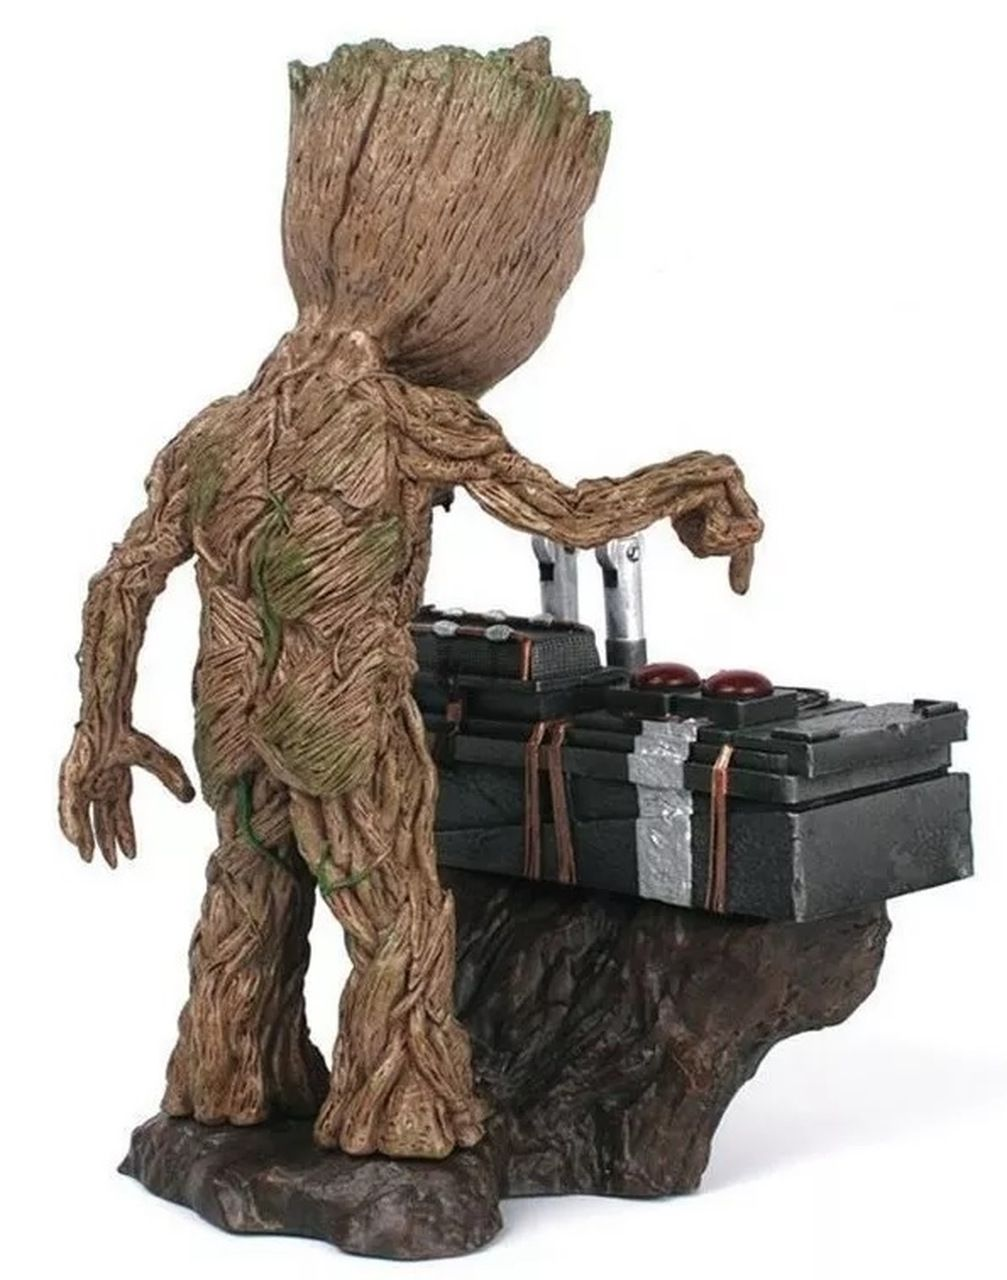 Action Figure Baby Groot (Detonador): Guardiões da Galáxia Vol. 2 (Guardians of the Galaxy Vol. 2)